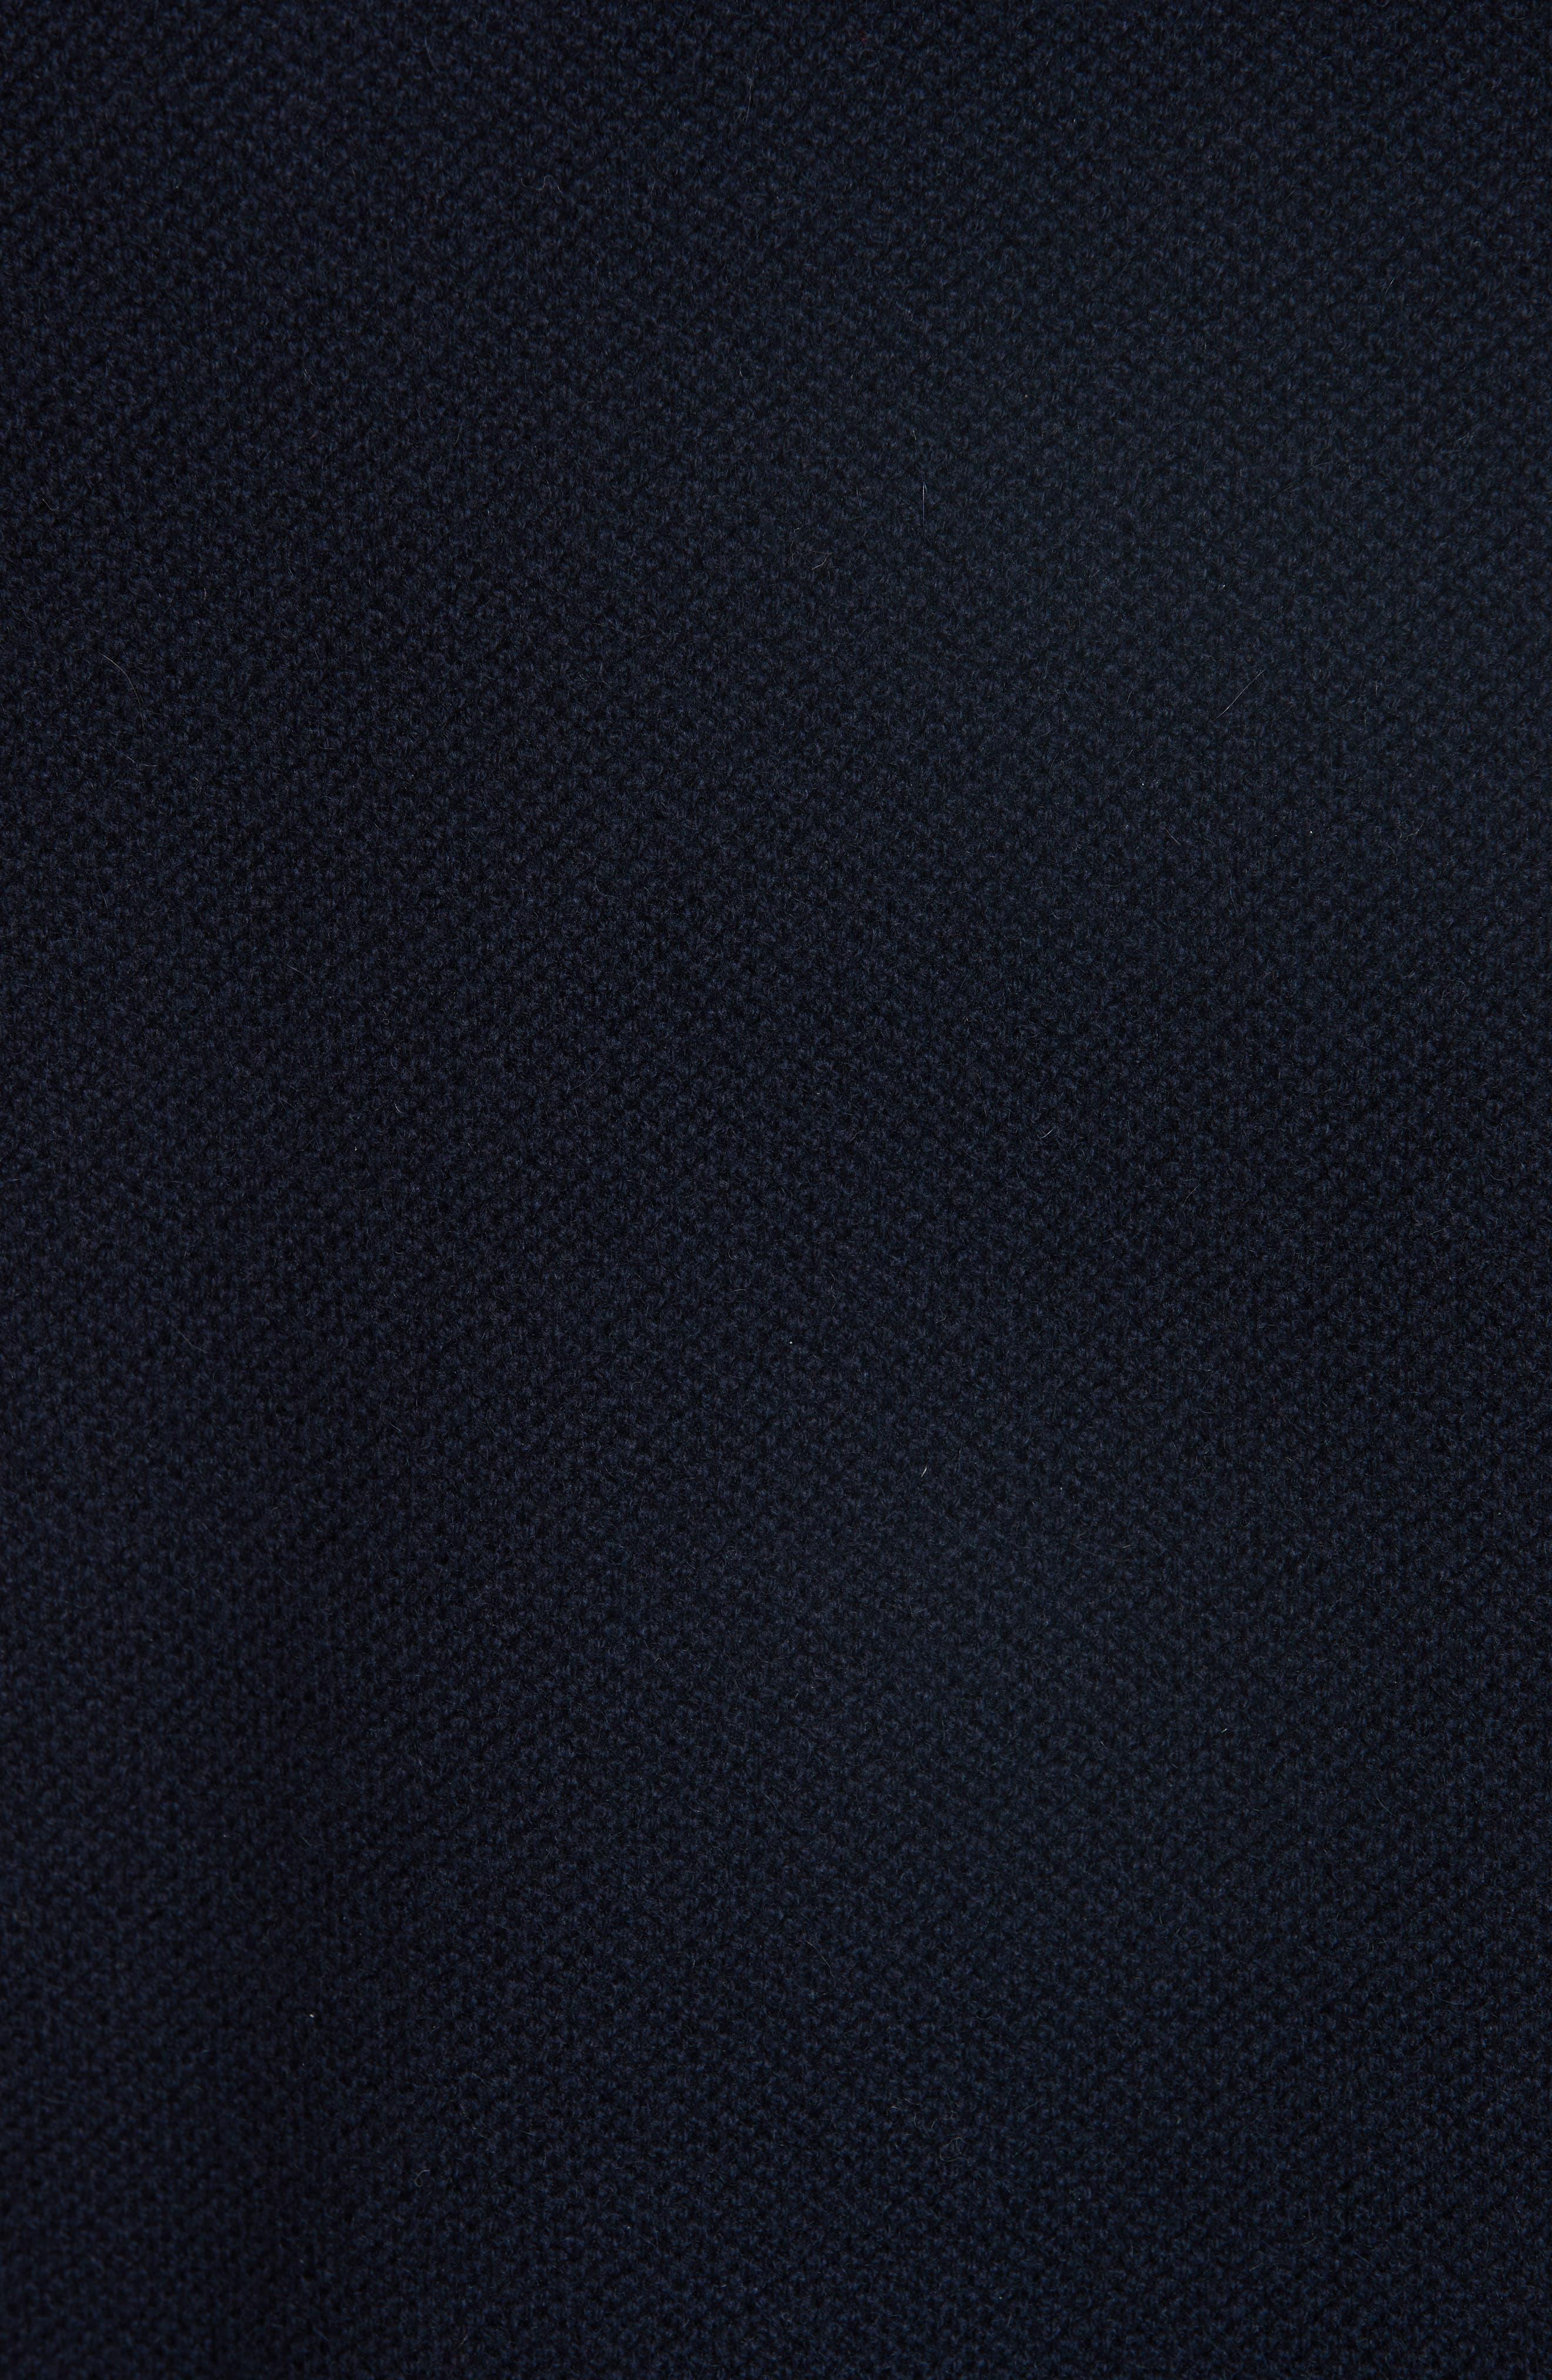 Wool & Cashmere Long Sleeve Polo,                             Alternate thumbnail 5, color,                             IAK NAVY